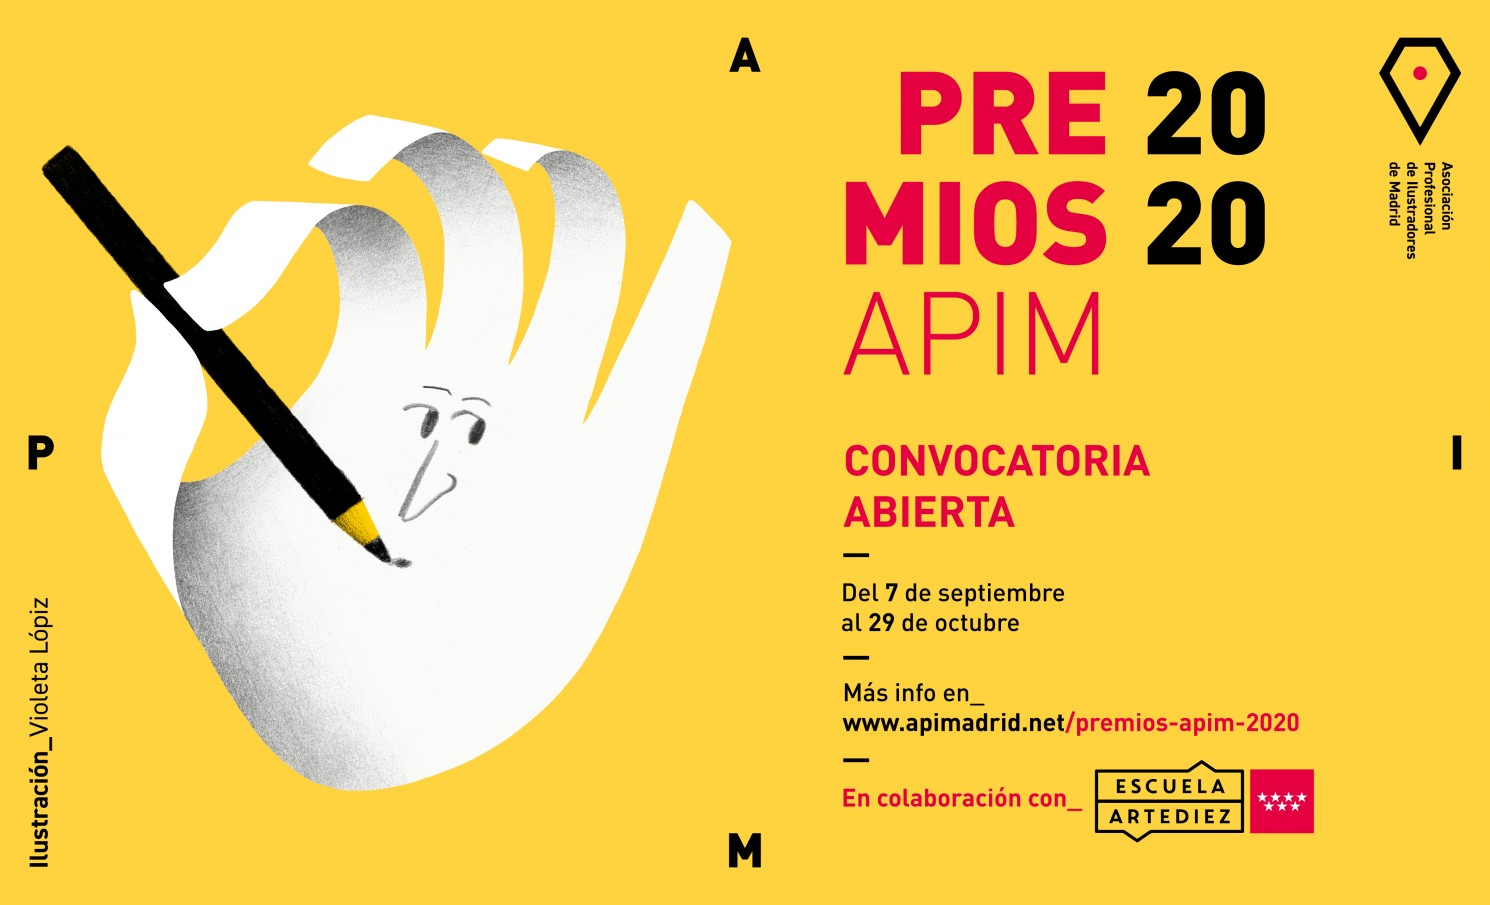 PREMIOS APIM 2020: CATEGORÍA B - MADRID Y SOCIOS APIM